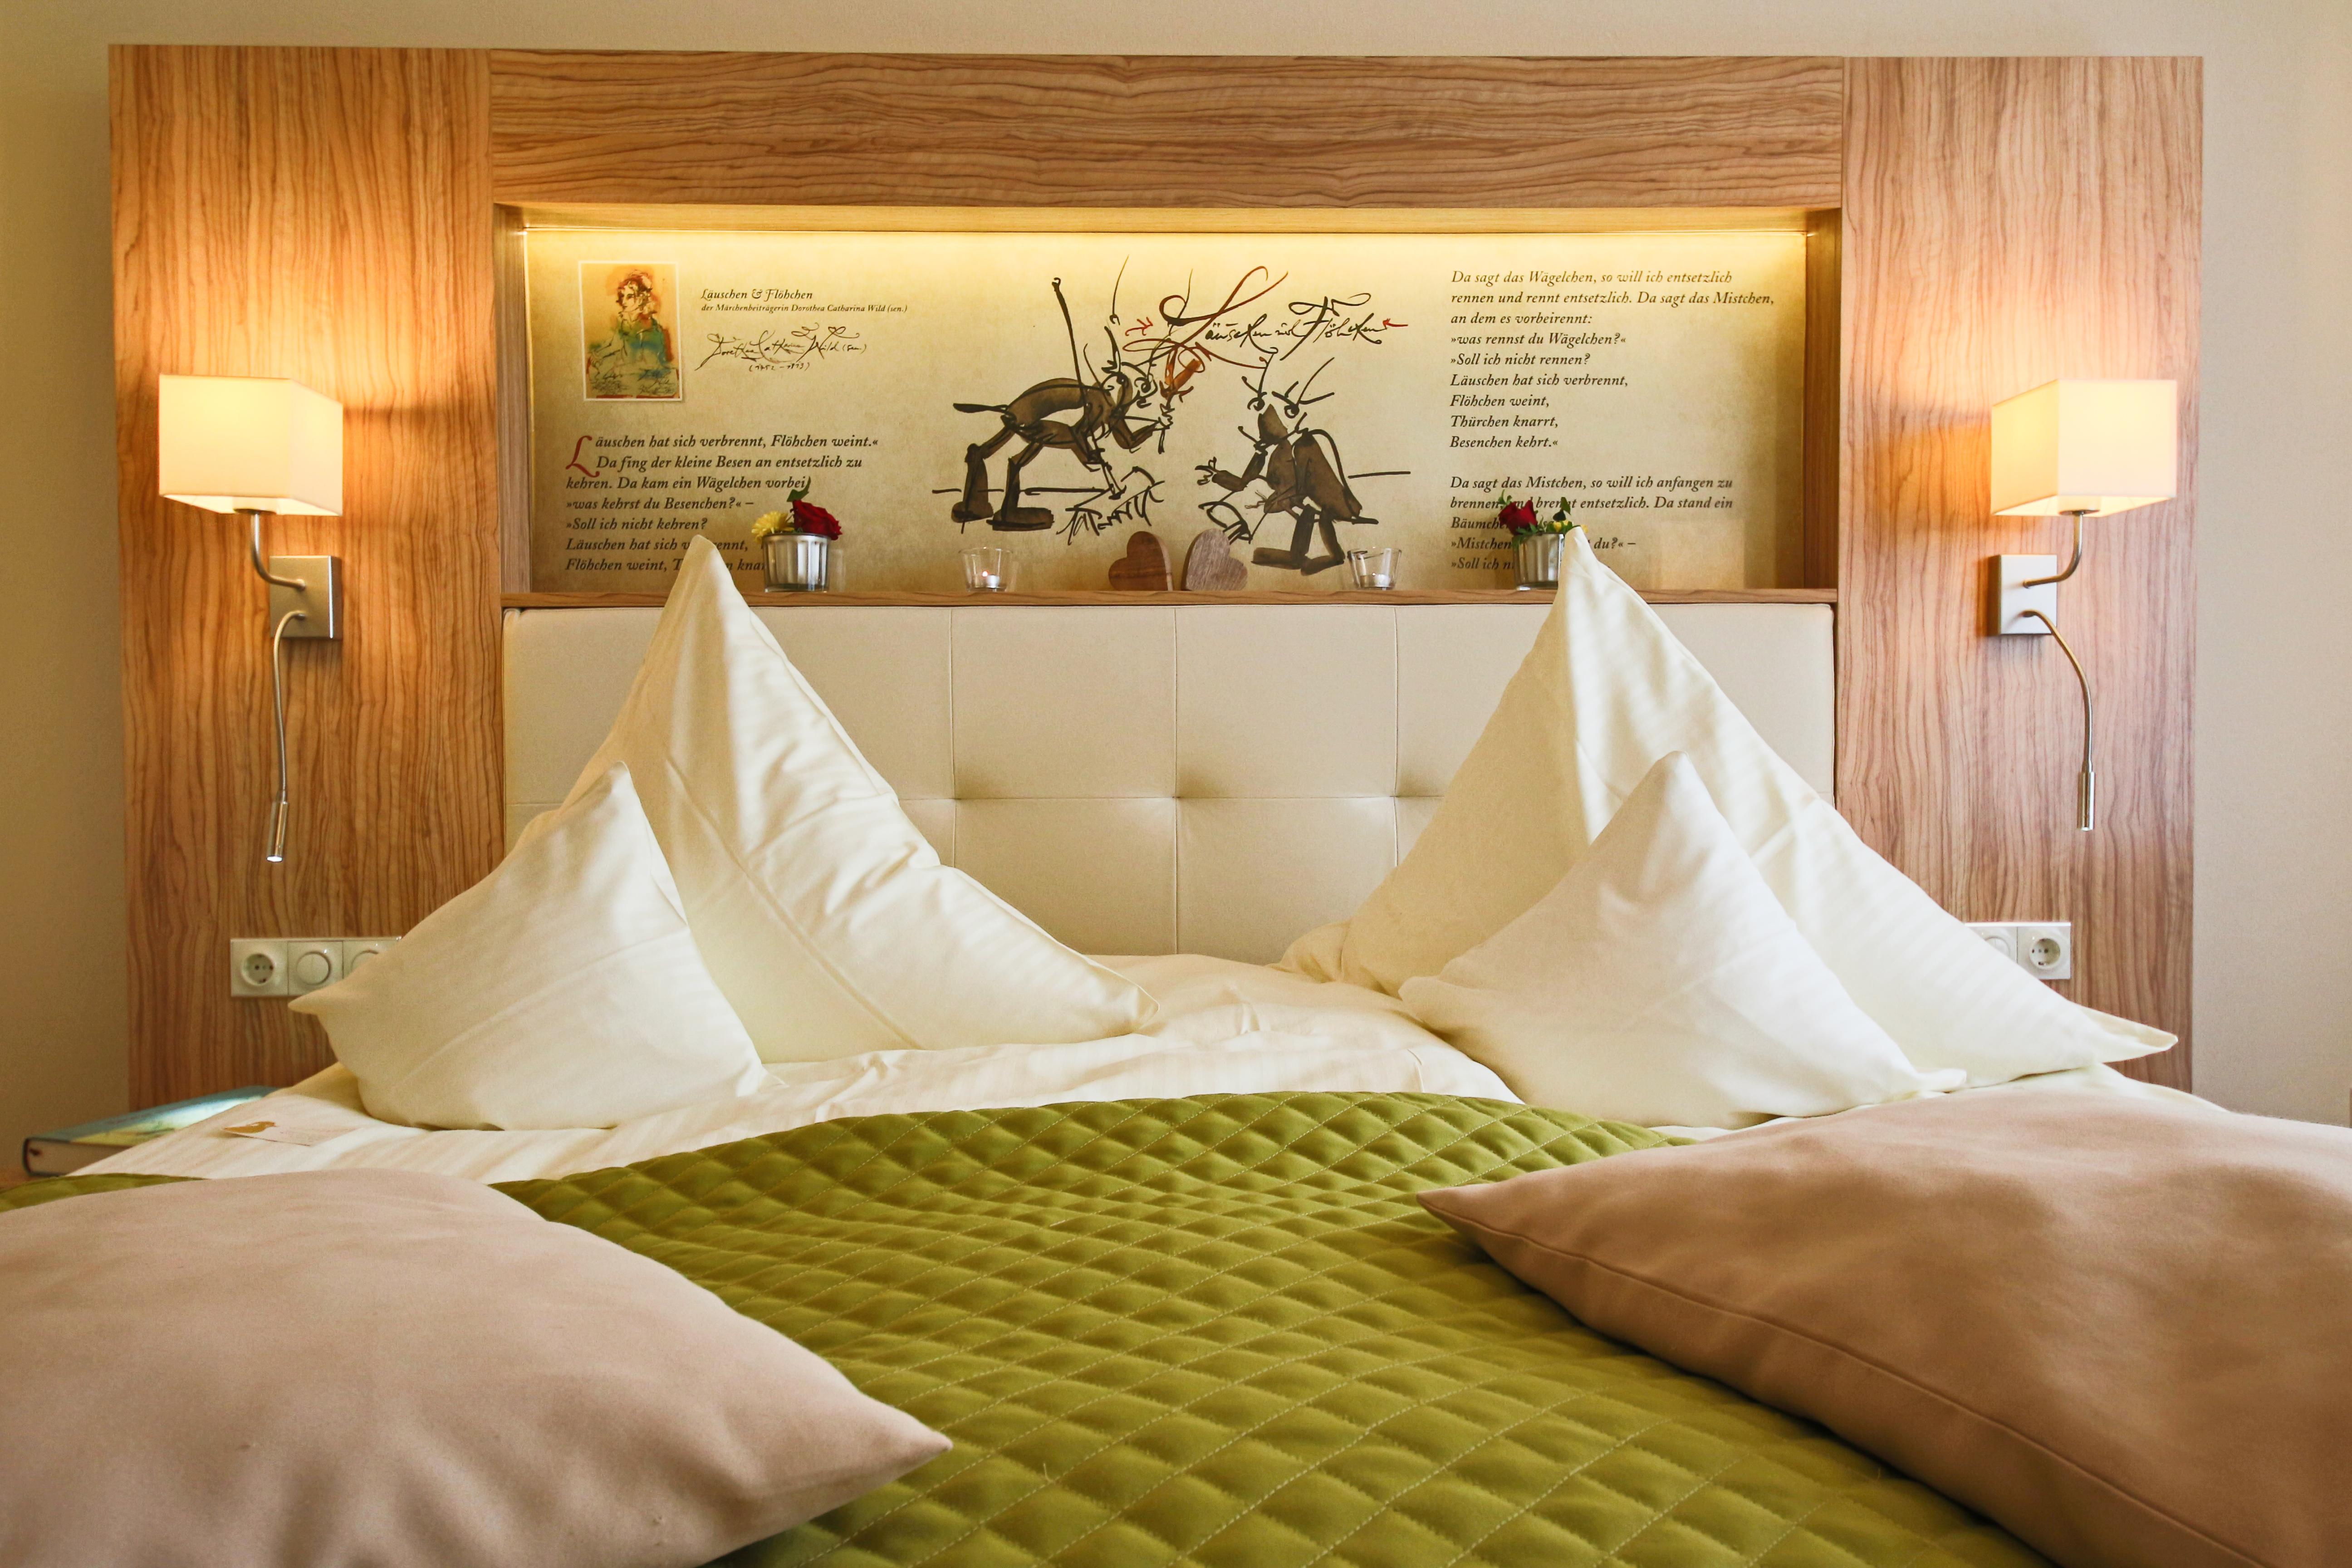 parkhotel-emstaler-hoehe-maerchenzimmer-comfort-boxspringbett